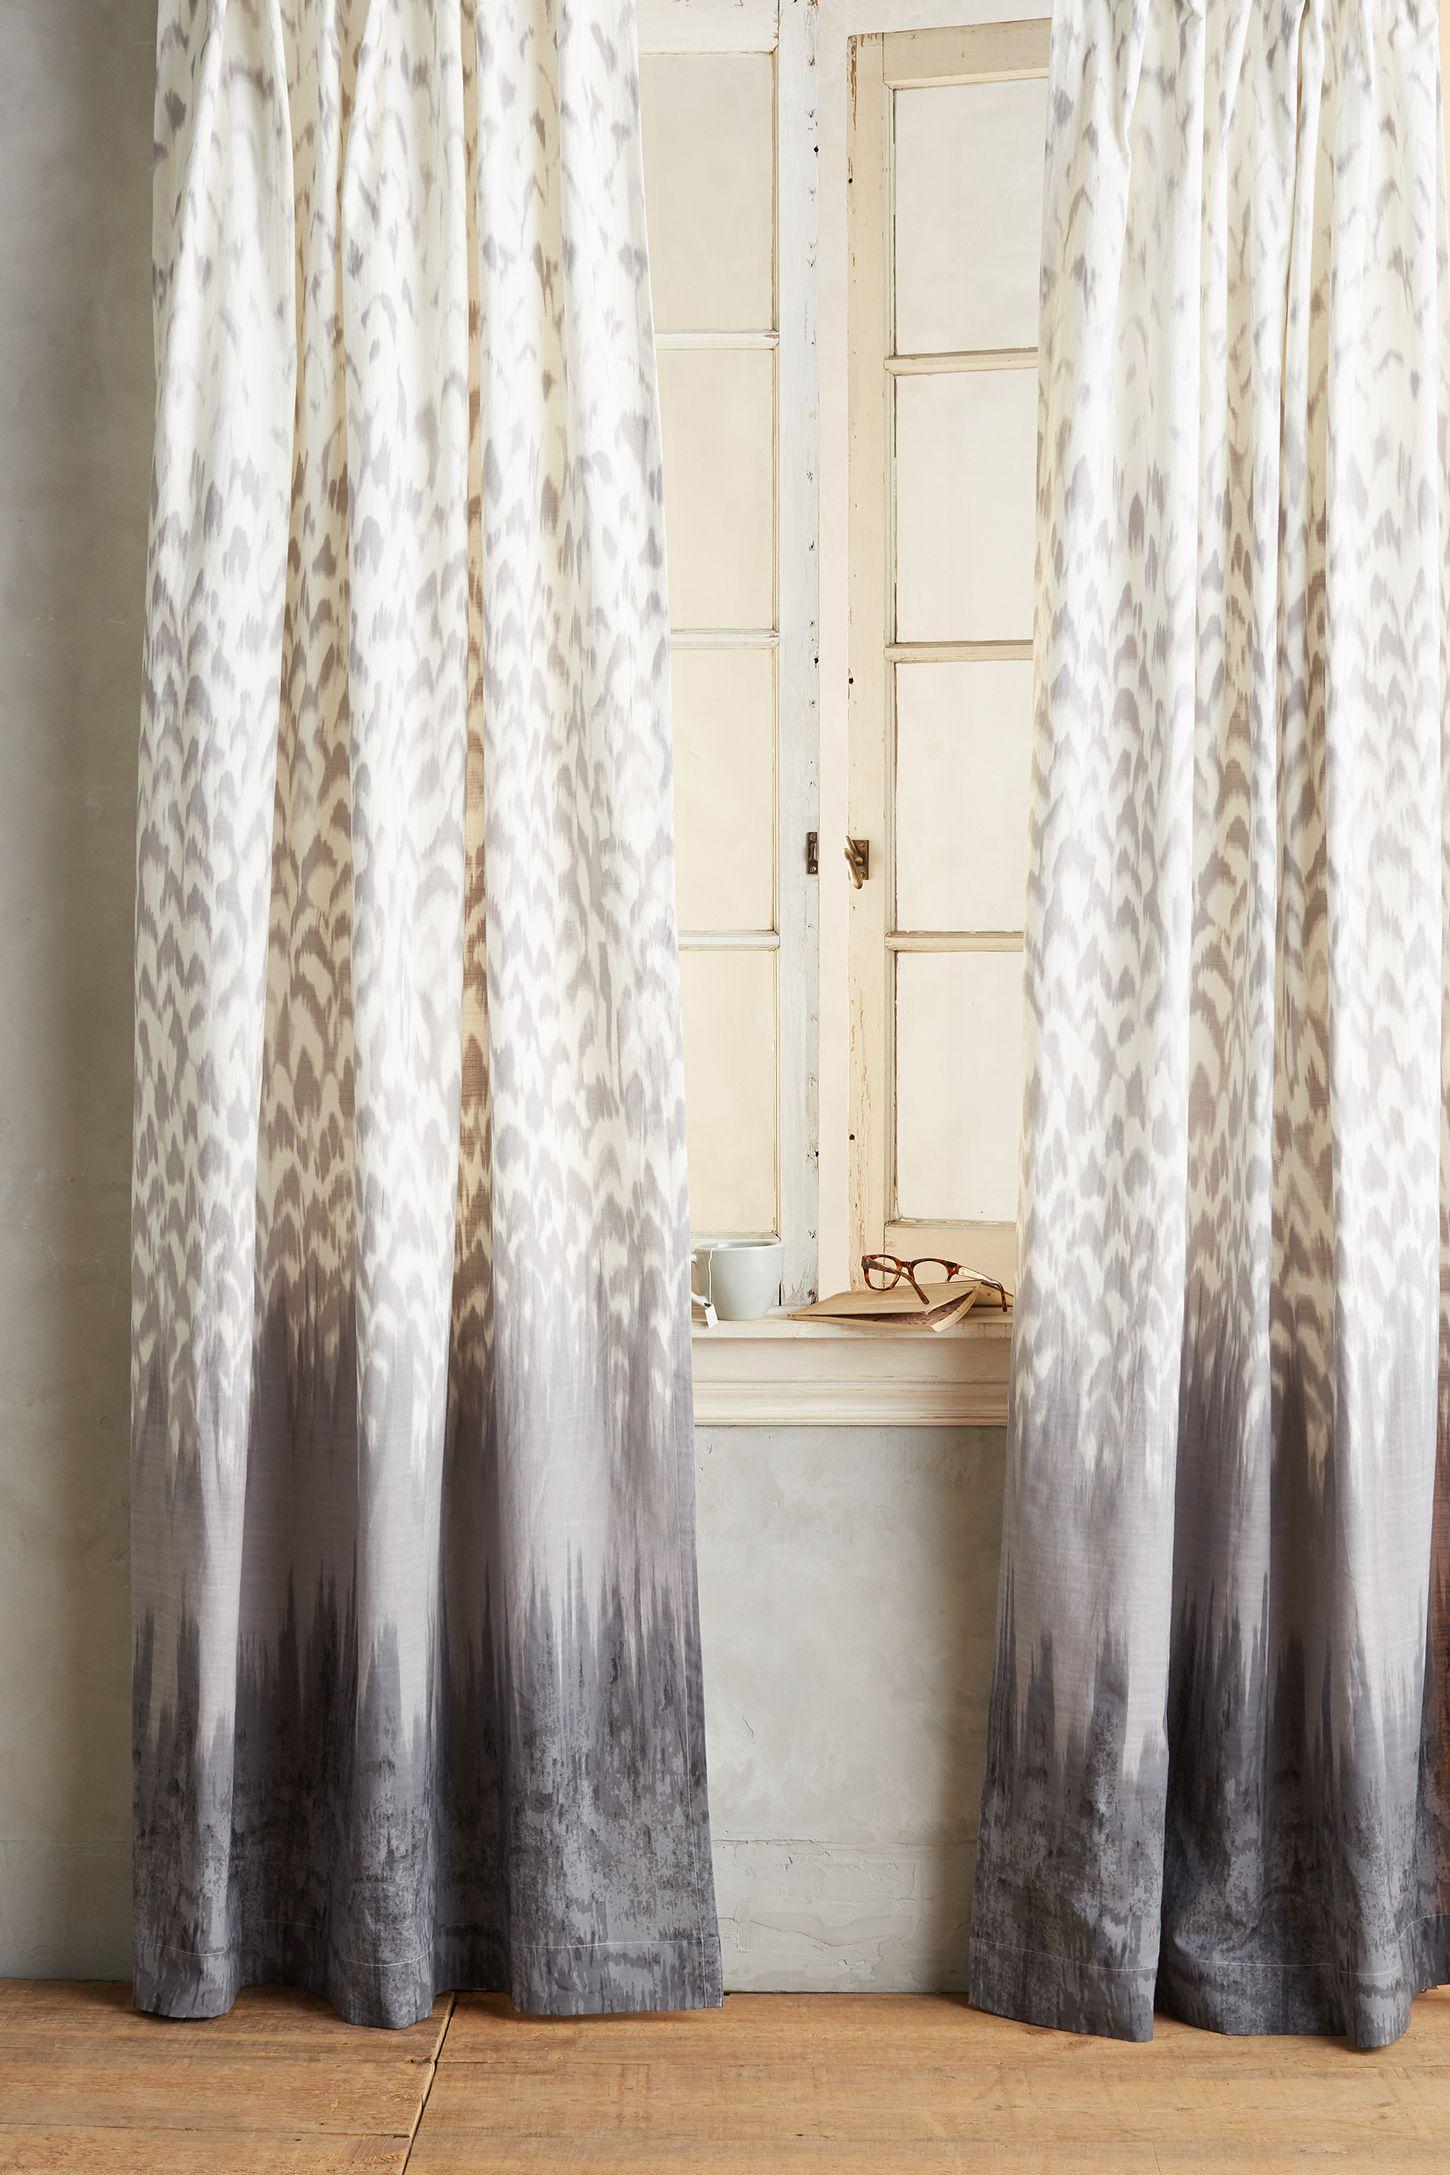 Anthropologie floral shower curtain - Anthropologie Floral Shower Curtain 51